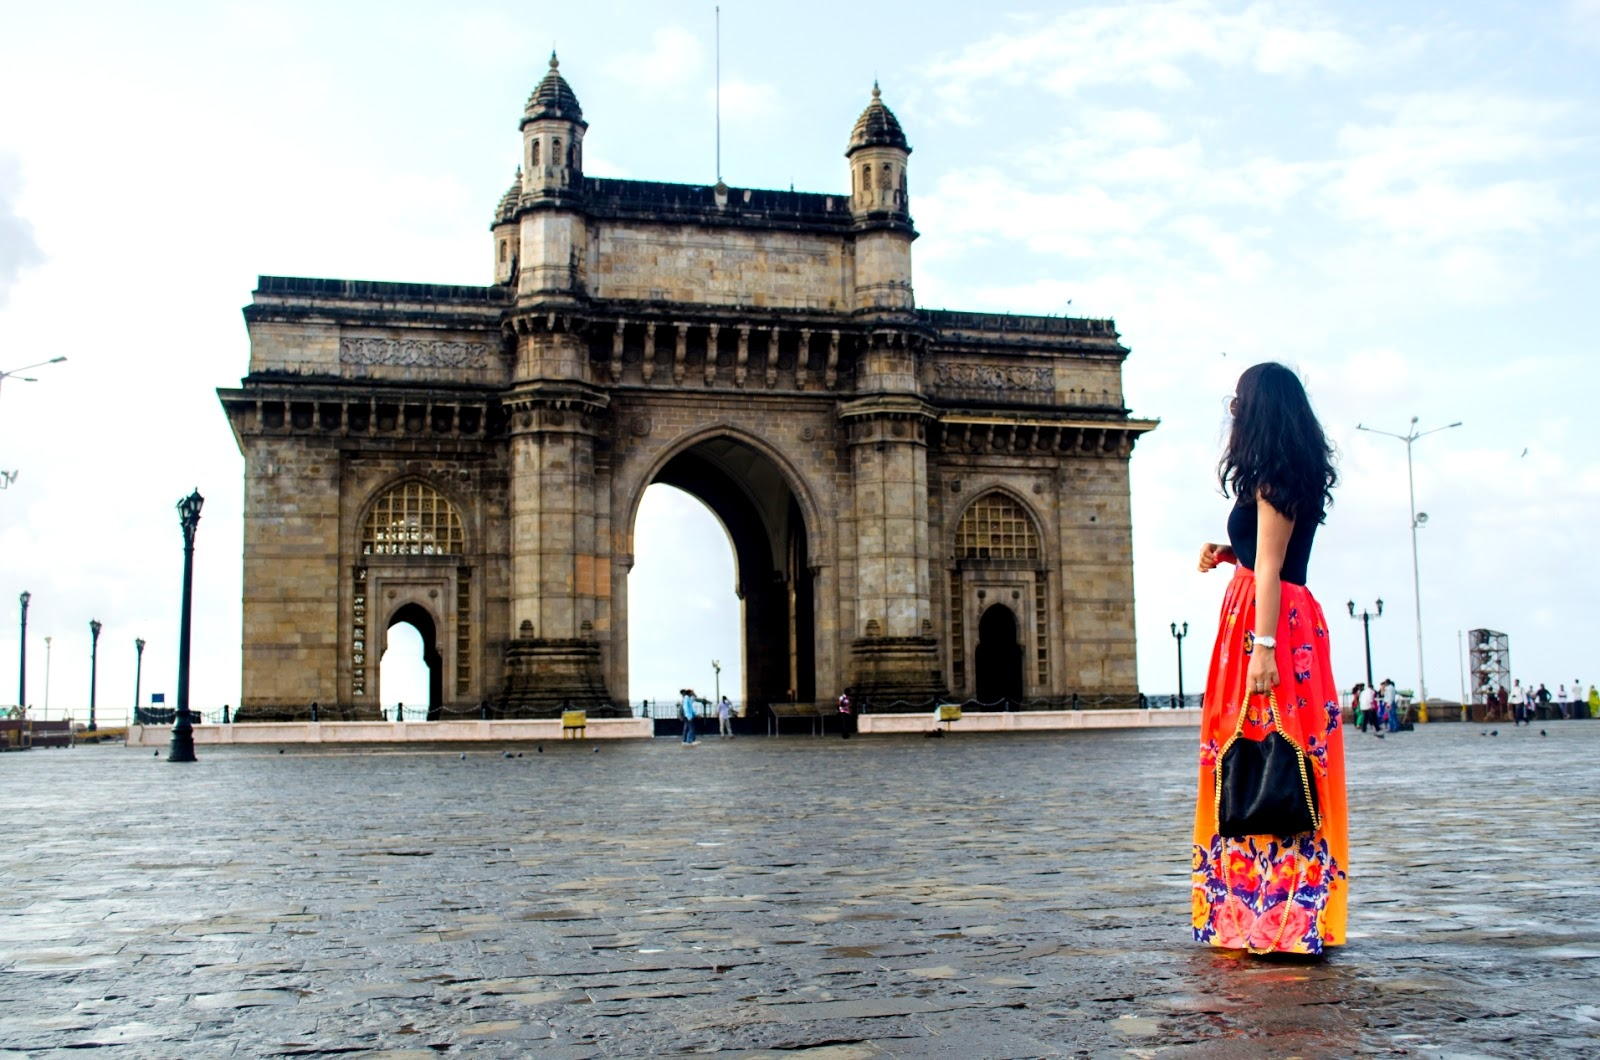 Vegan Fashion - Floral for Fall - Best Fashion Blogger in India - Style Destino - Mumbai Fashion Guide